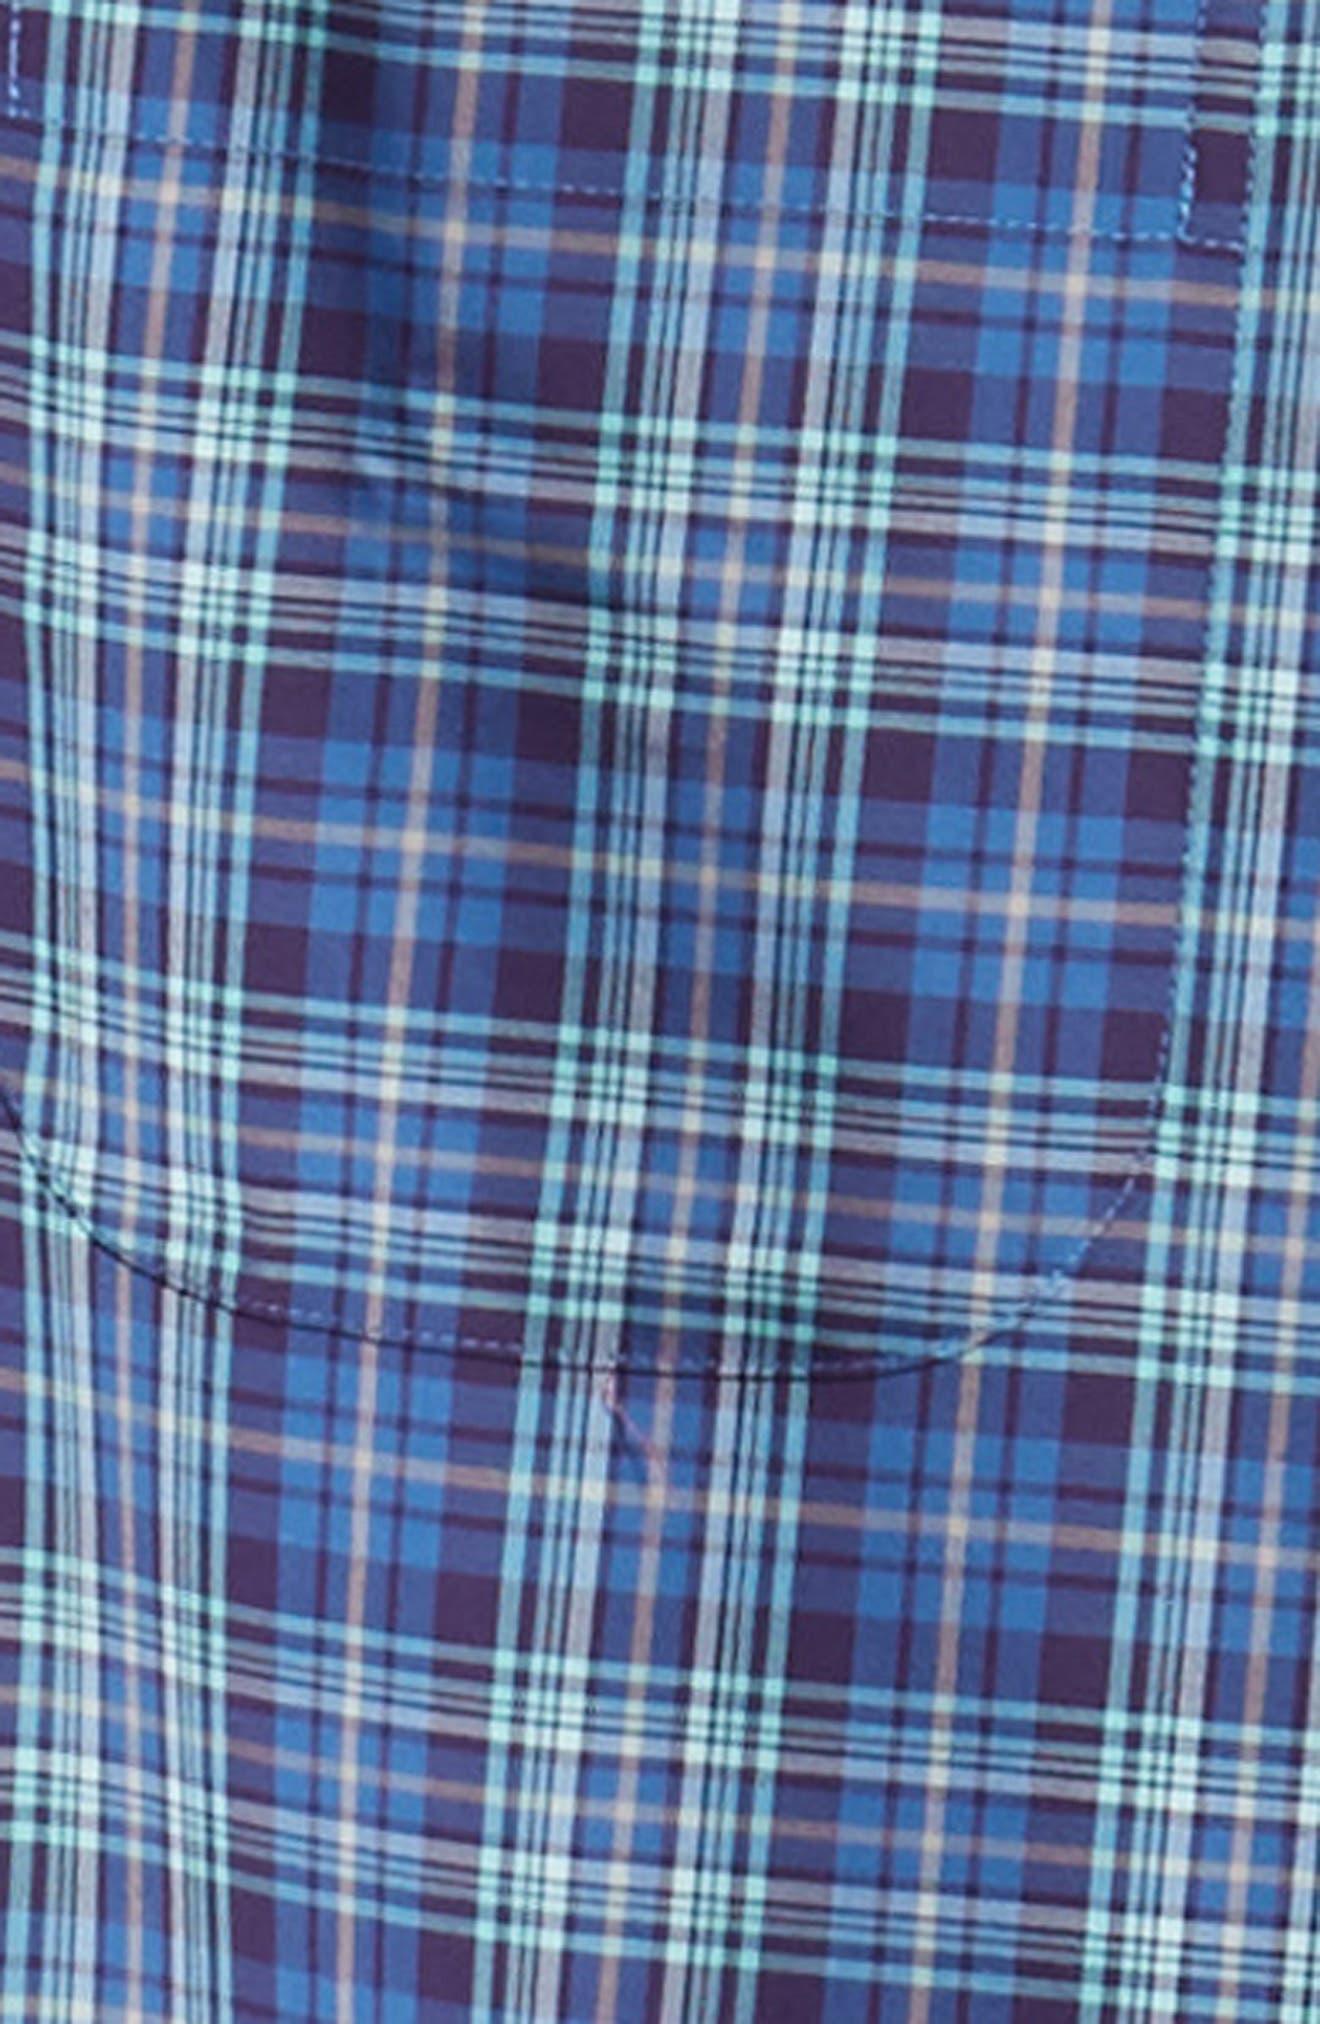 Crown Ease Flatey Island Regular Fit Tartan Plaid Sport Shirt,                             Alternate thumbnail 6, color,                             BLUE